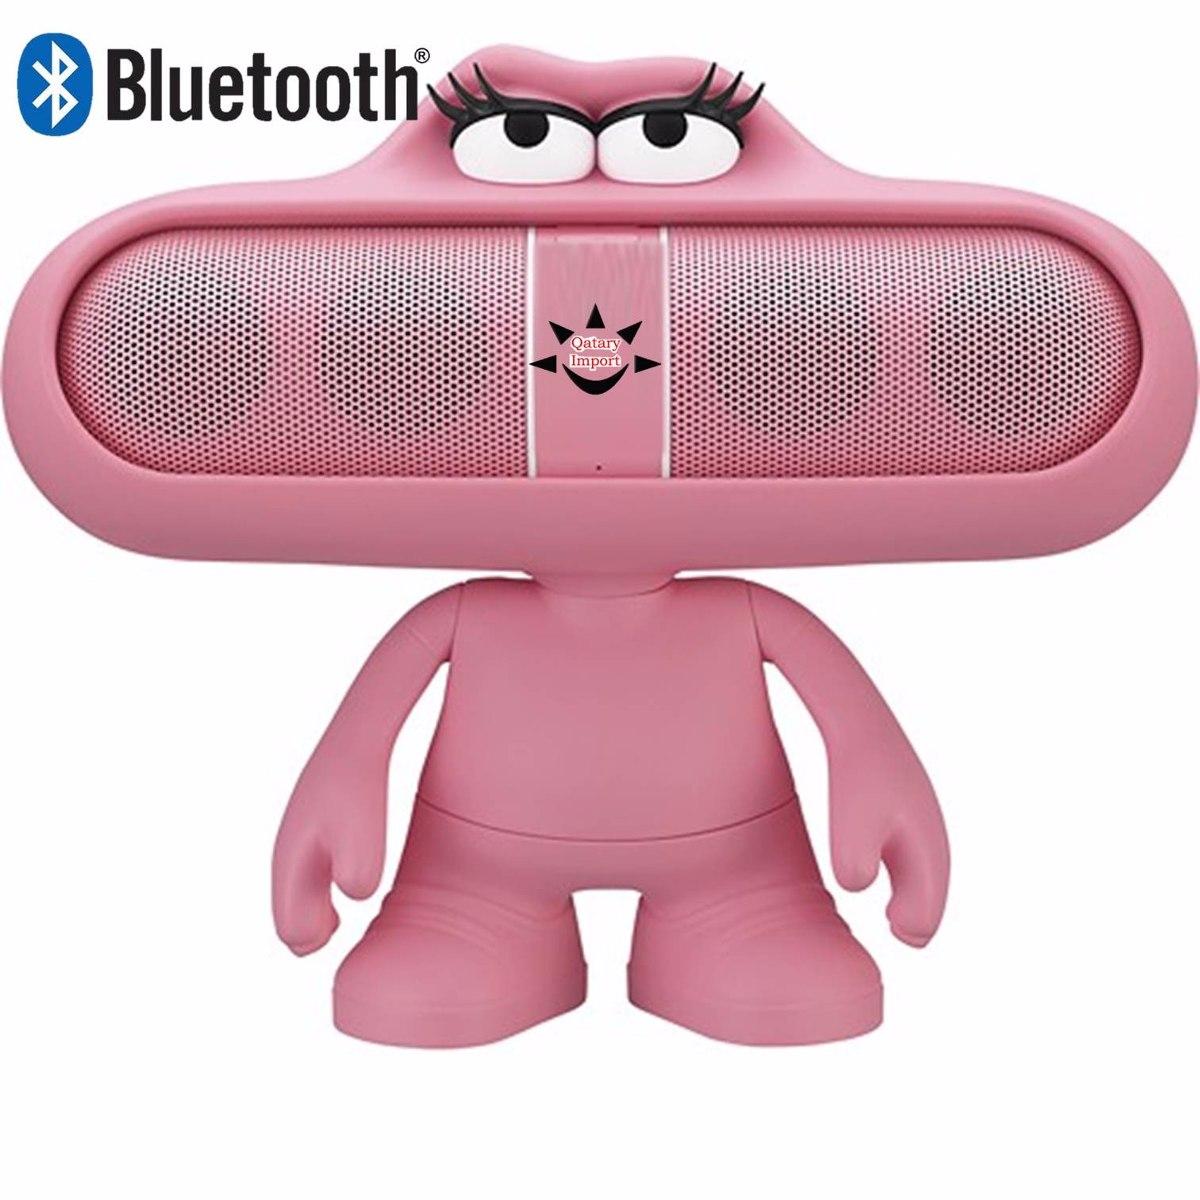 parlante bt bluetooth pill mp3 radio fm muñeco dude rosado